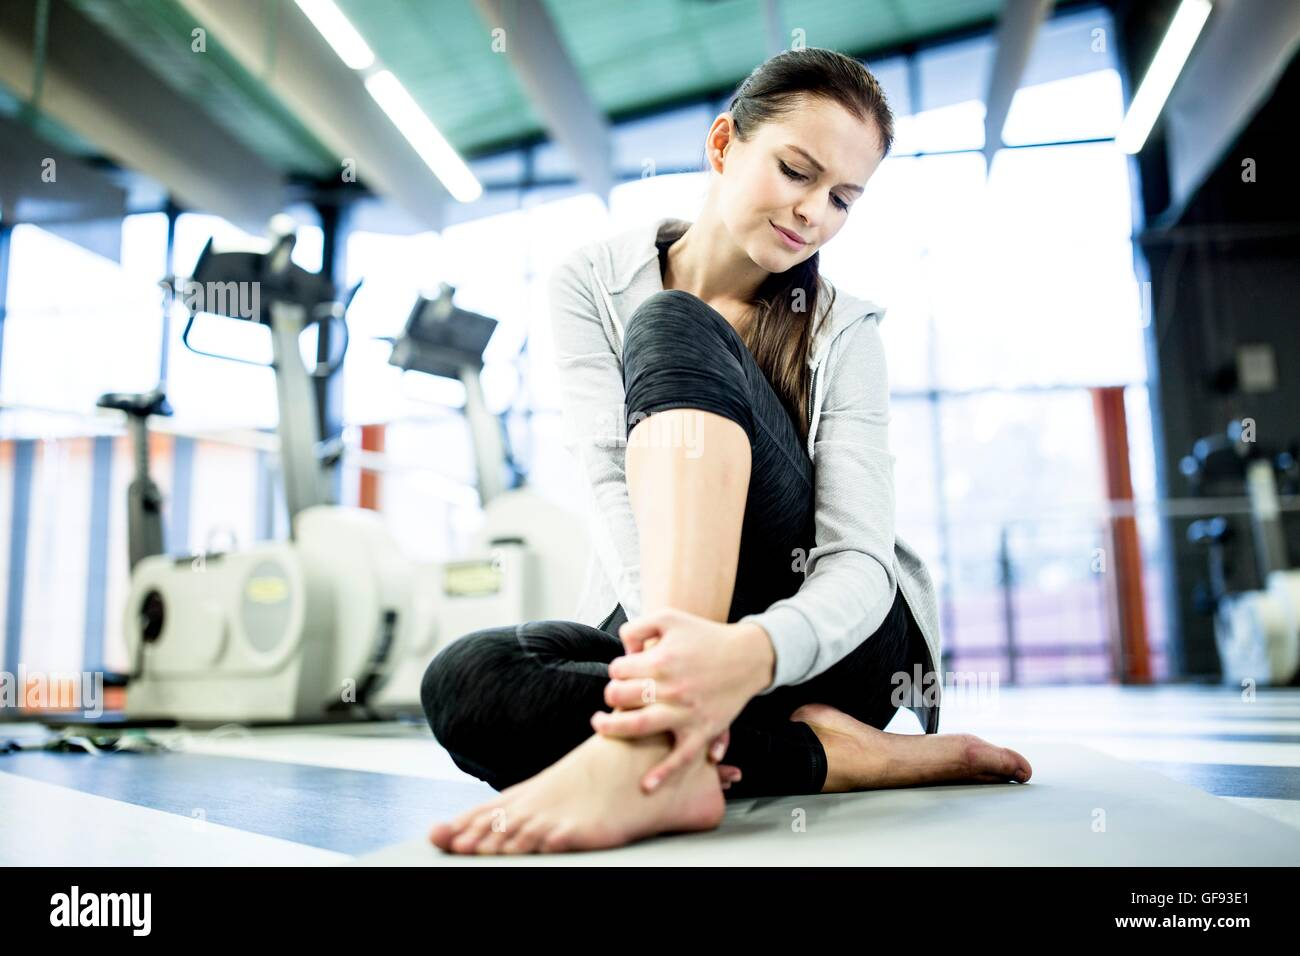 EIGENTUM FREIGEGEBEN. -MODELL VERÖFFENTLICHT. Junge Frau massiert Knöchel bei Schmerzen am Sprunggelenk Stockbild